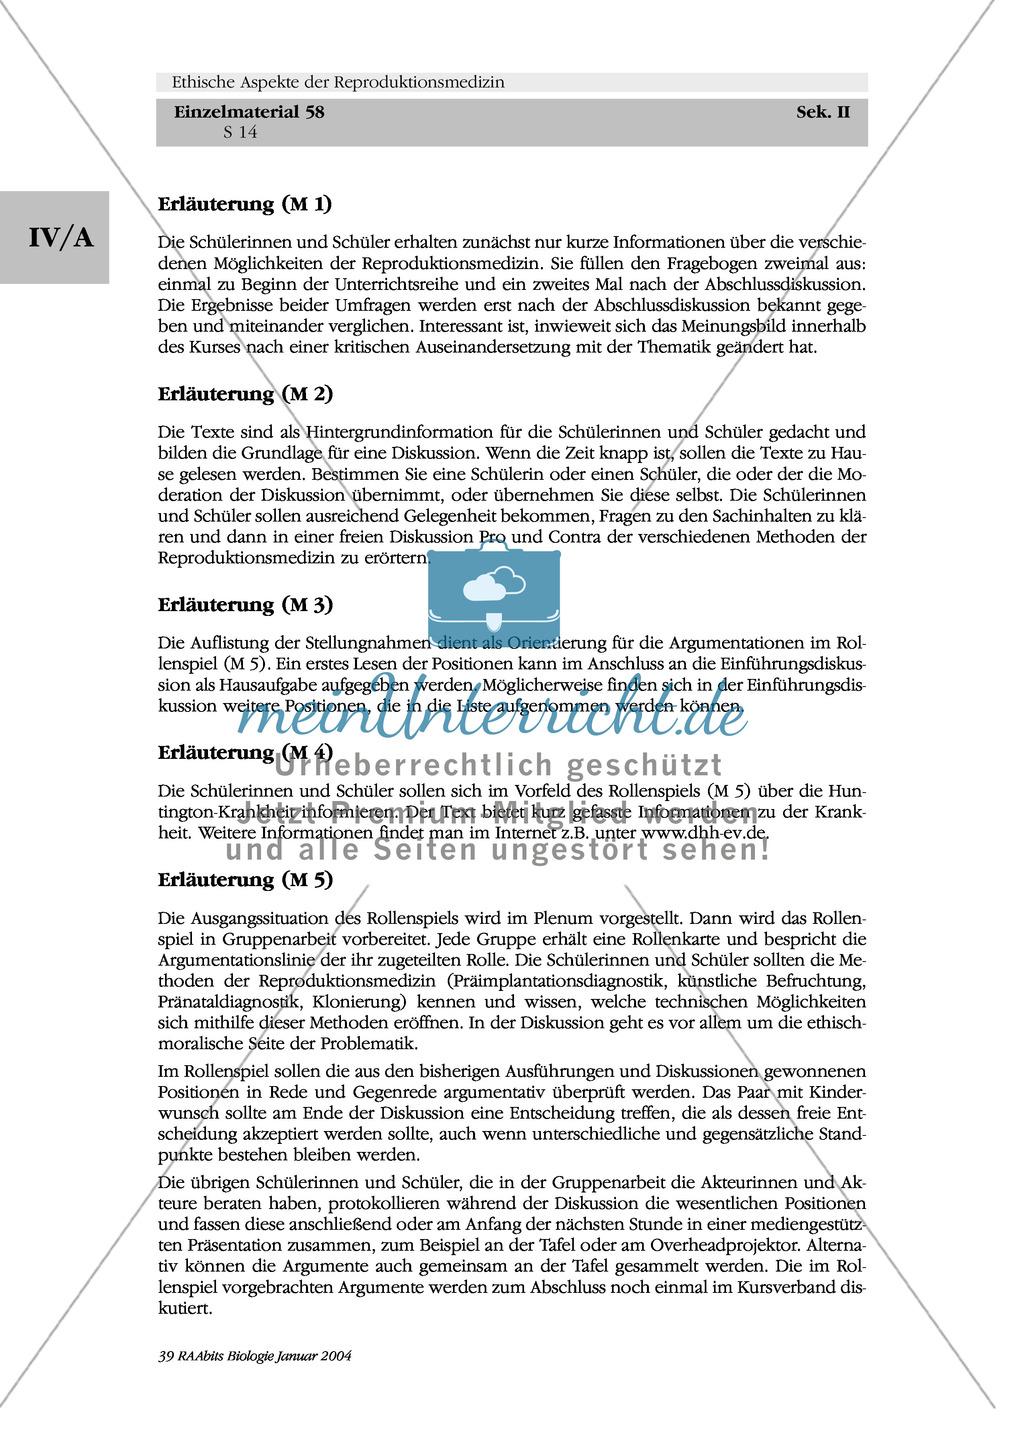 Ethische Aspekte der Reproduktionsmedizin: Pro + Contra Preview 3